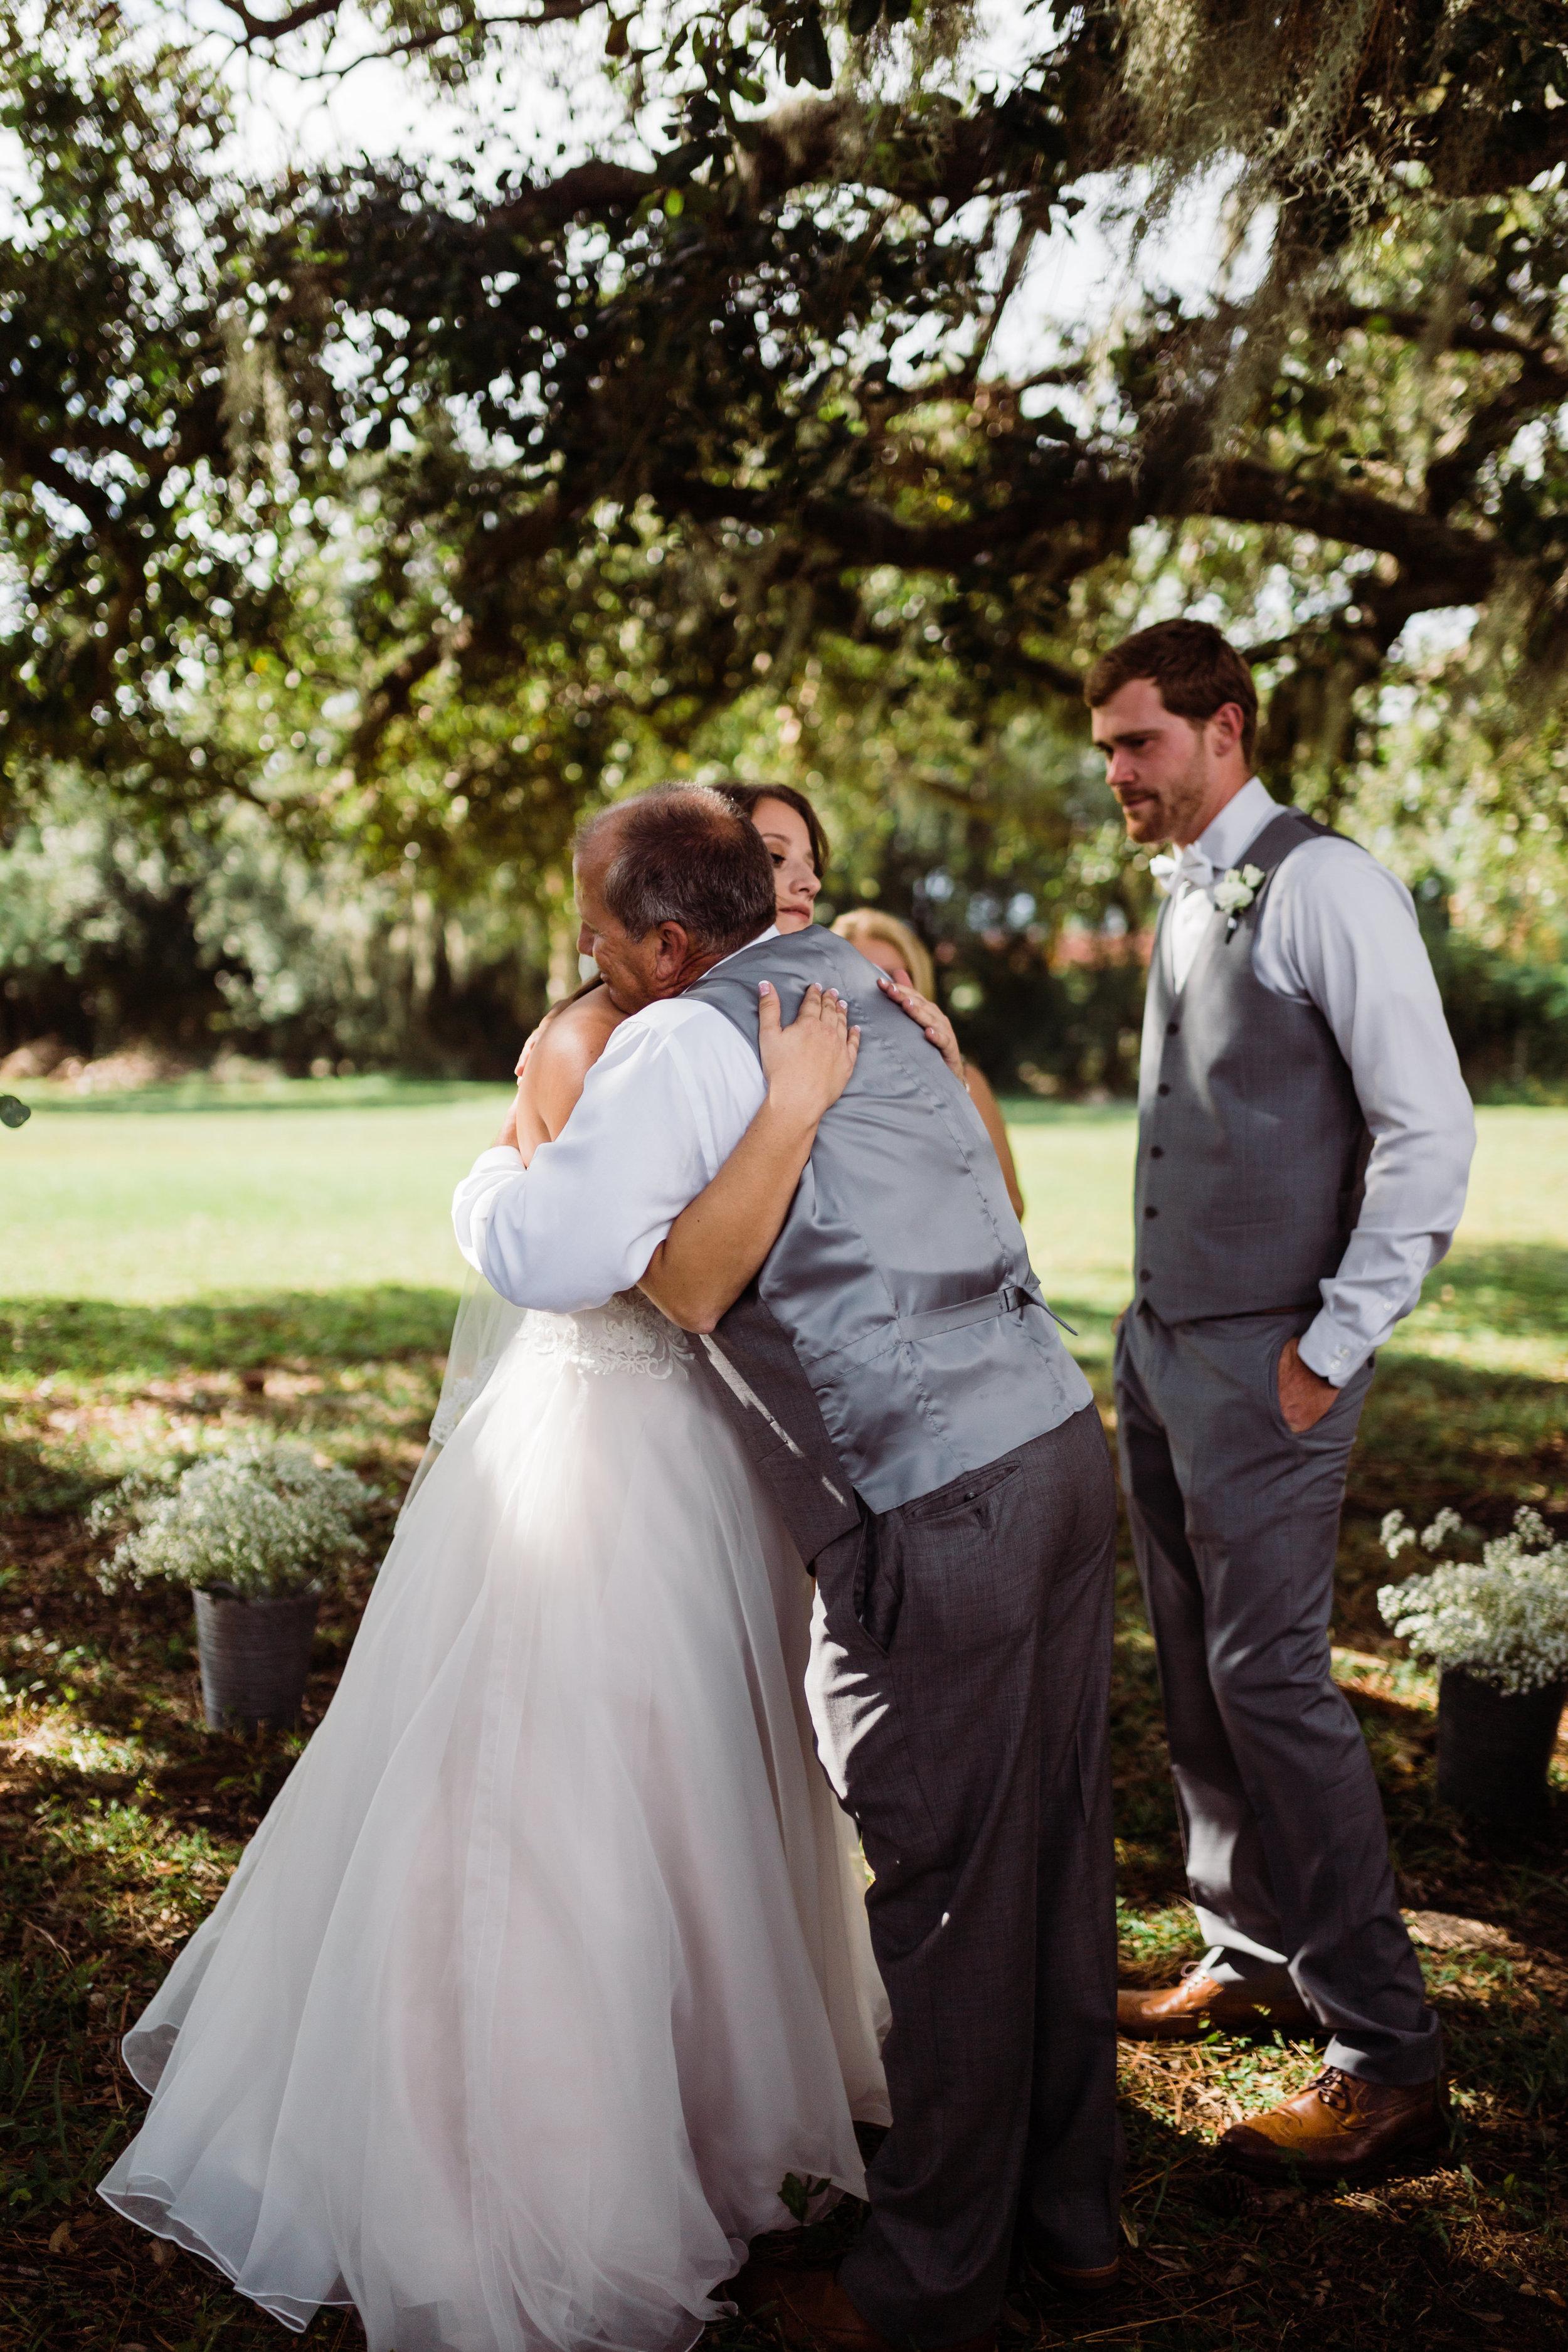 2017.10.14 Samantha and Matthew Crabtree Sarasota Wedding (141 of 708).jpg